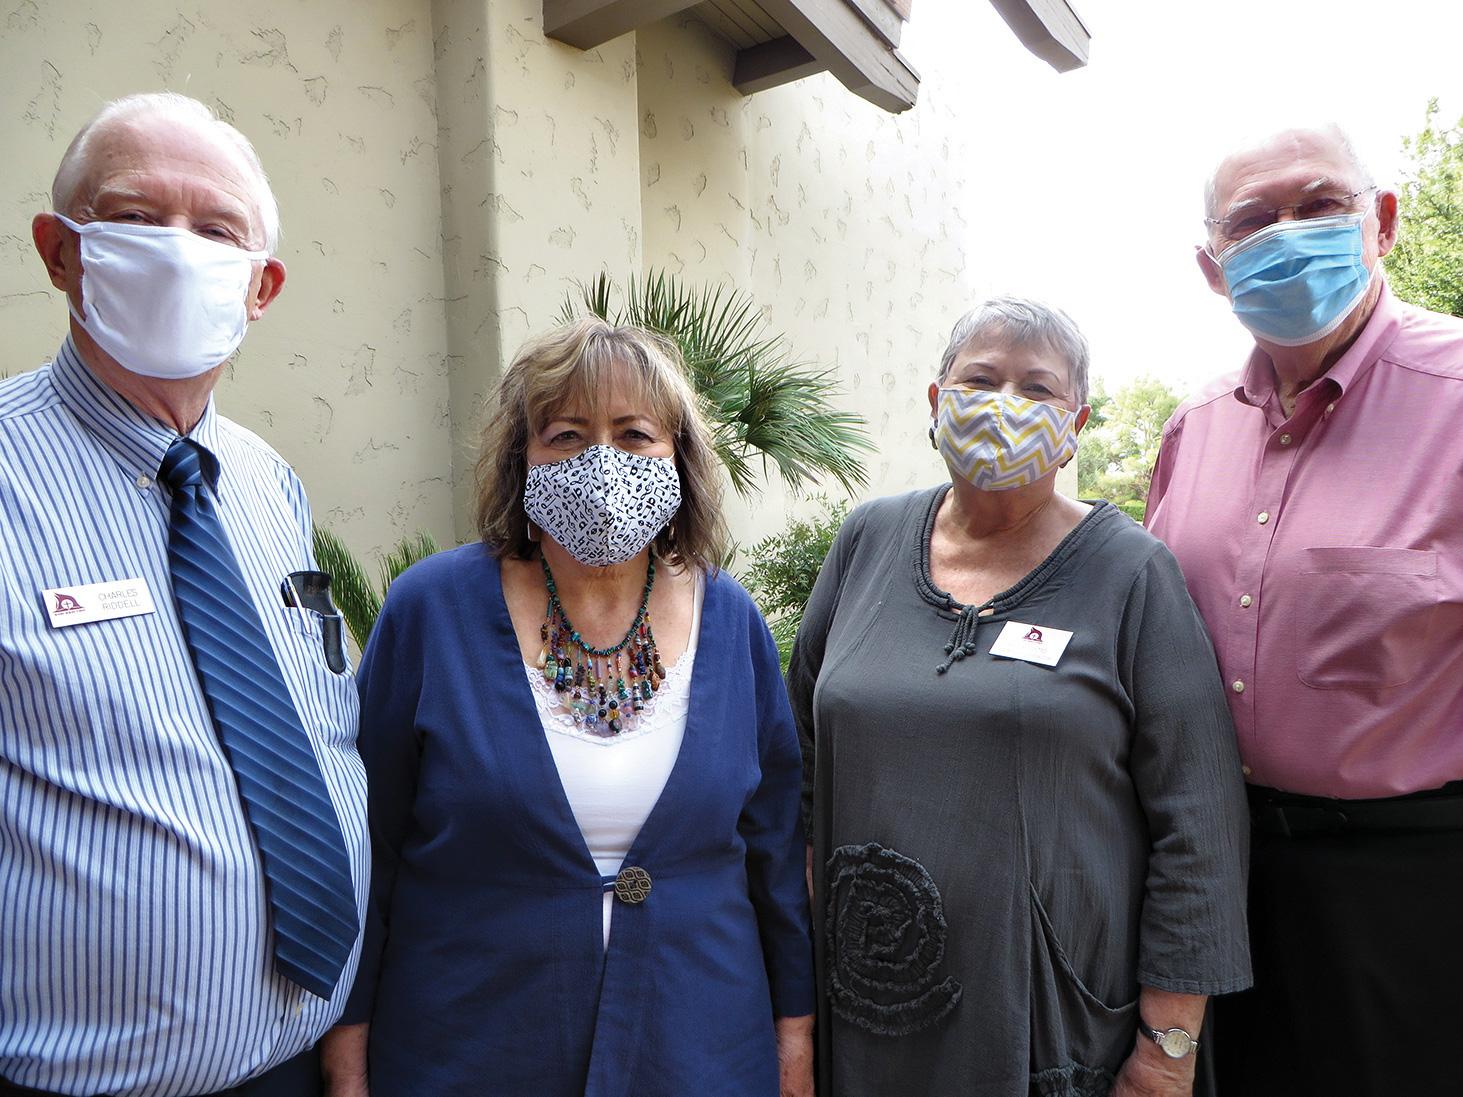 Resurrection Church staff (from left): Charles Riddell, Susan Tjossem, Karen Hustad, and Pastor Wayne Viereck